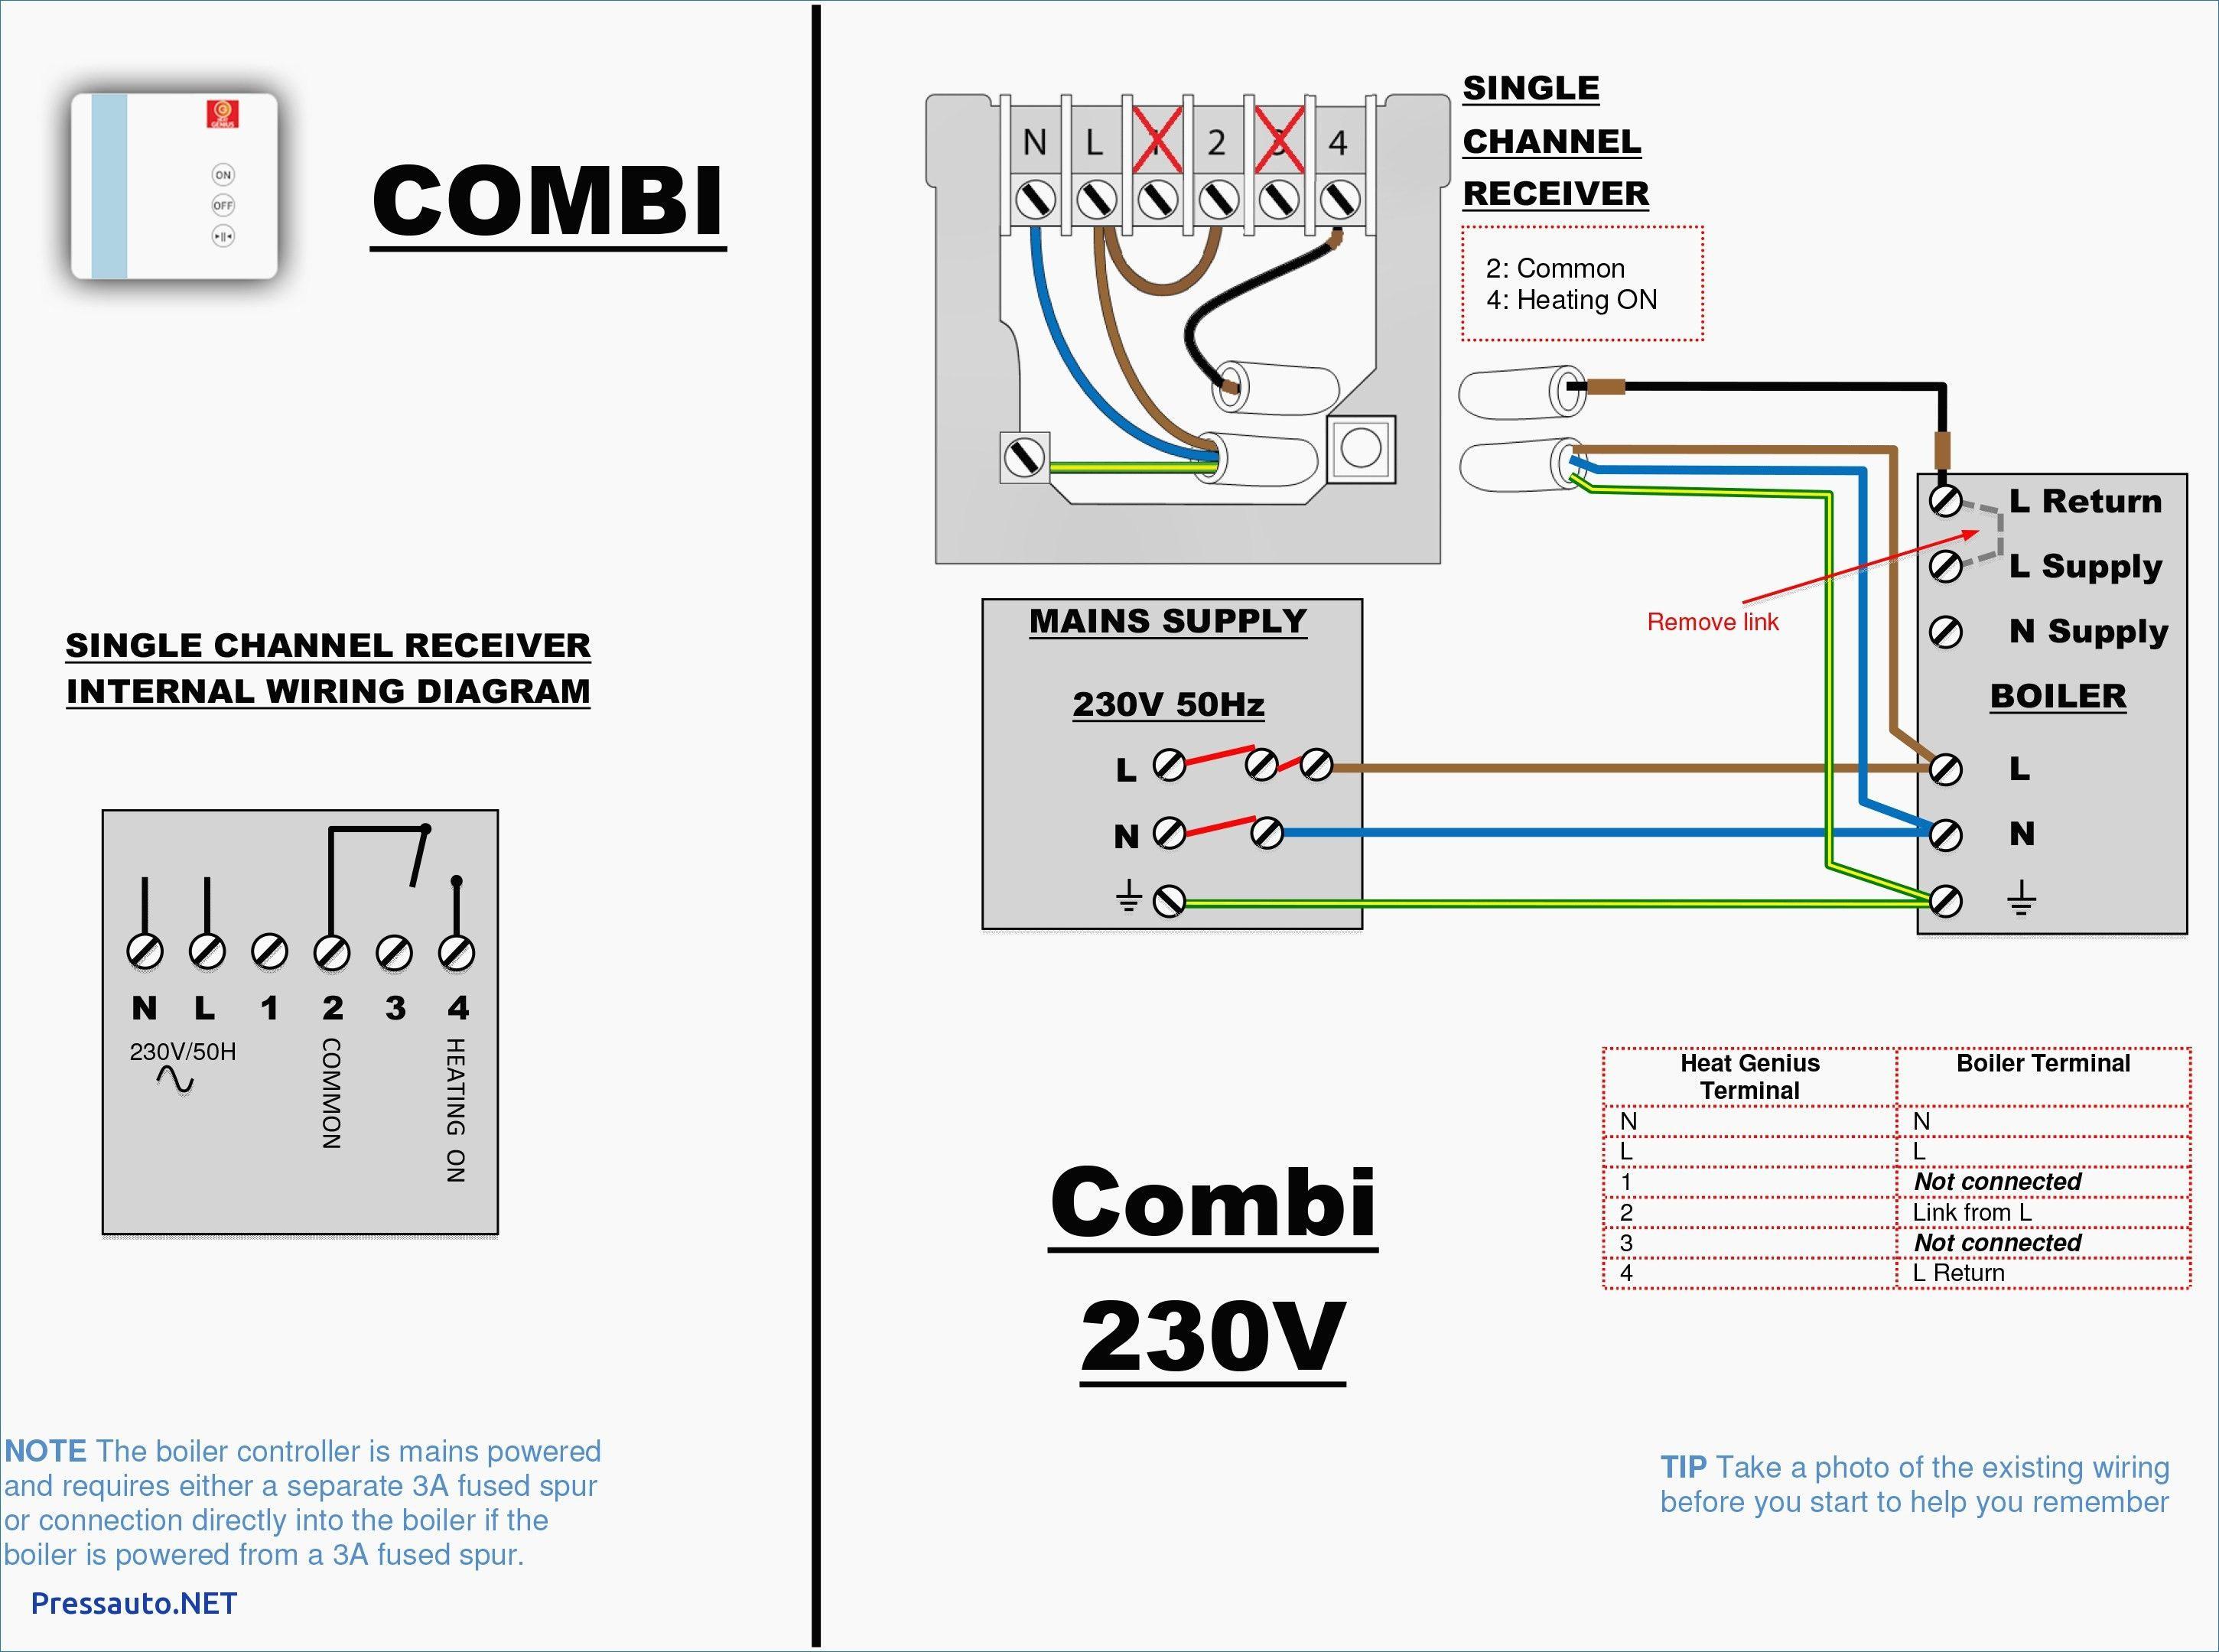 medium resolution of wiring diagram for underfloor heating to combi boiler wiring unique wiring diagram underfloor heating diagrams digramssample